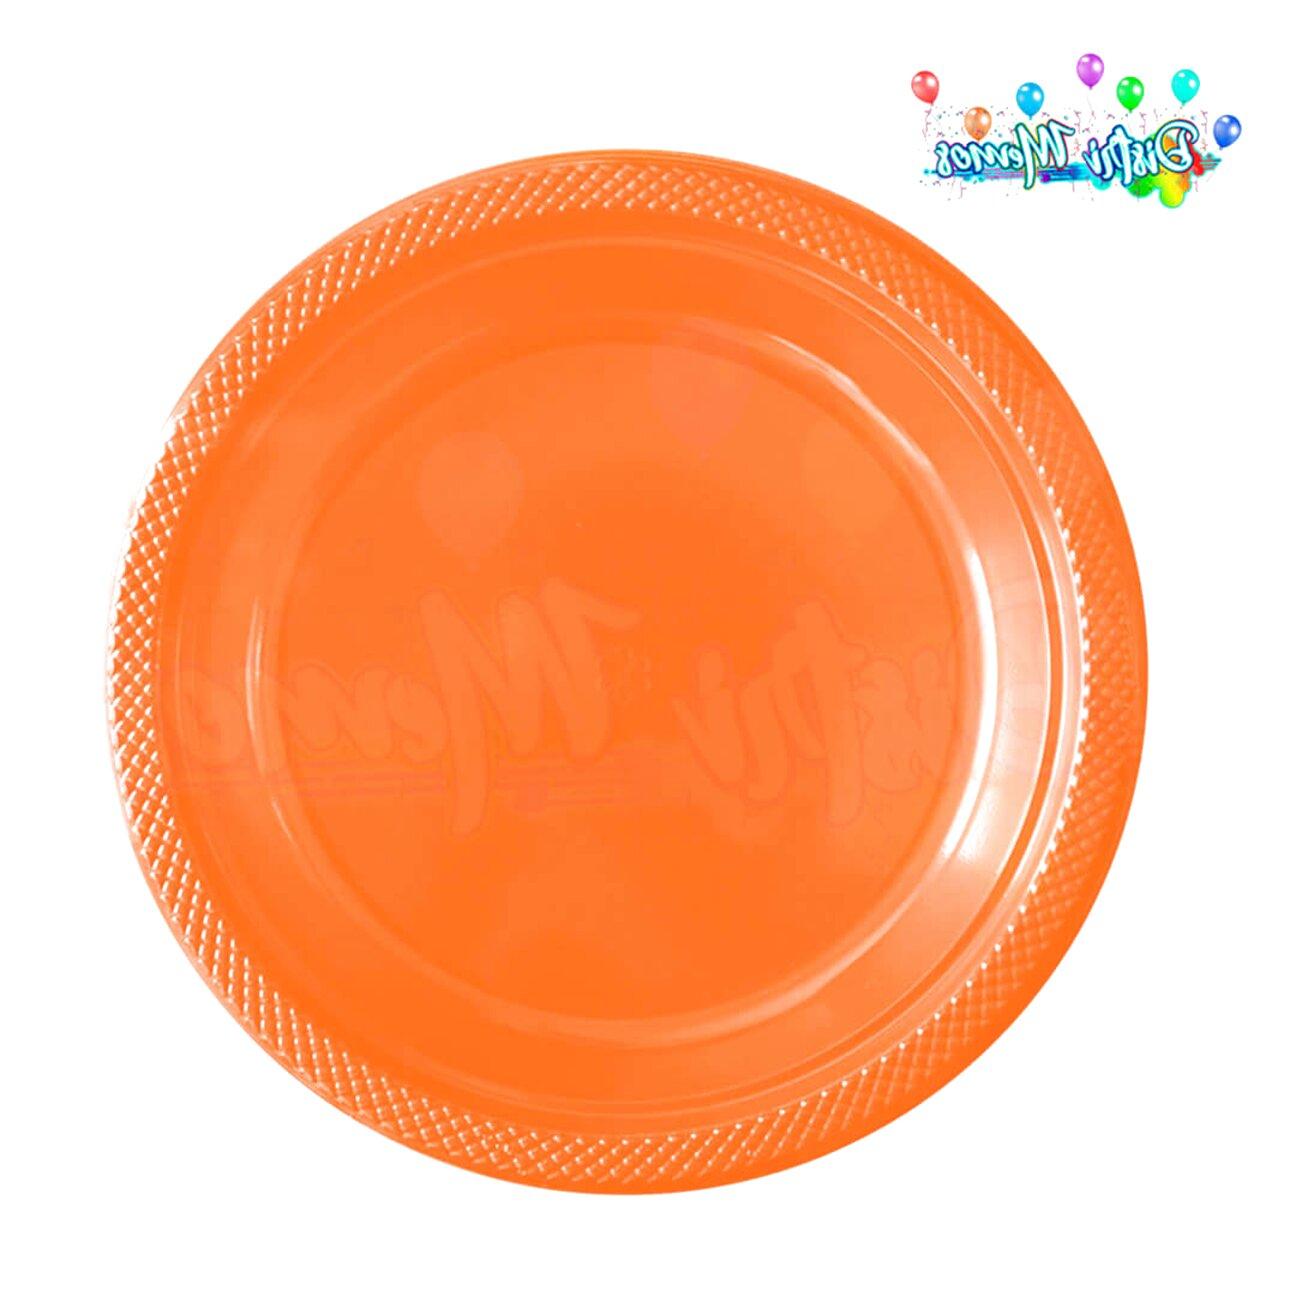 plato naranja de segunda mano